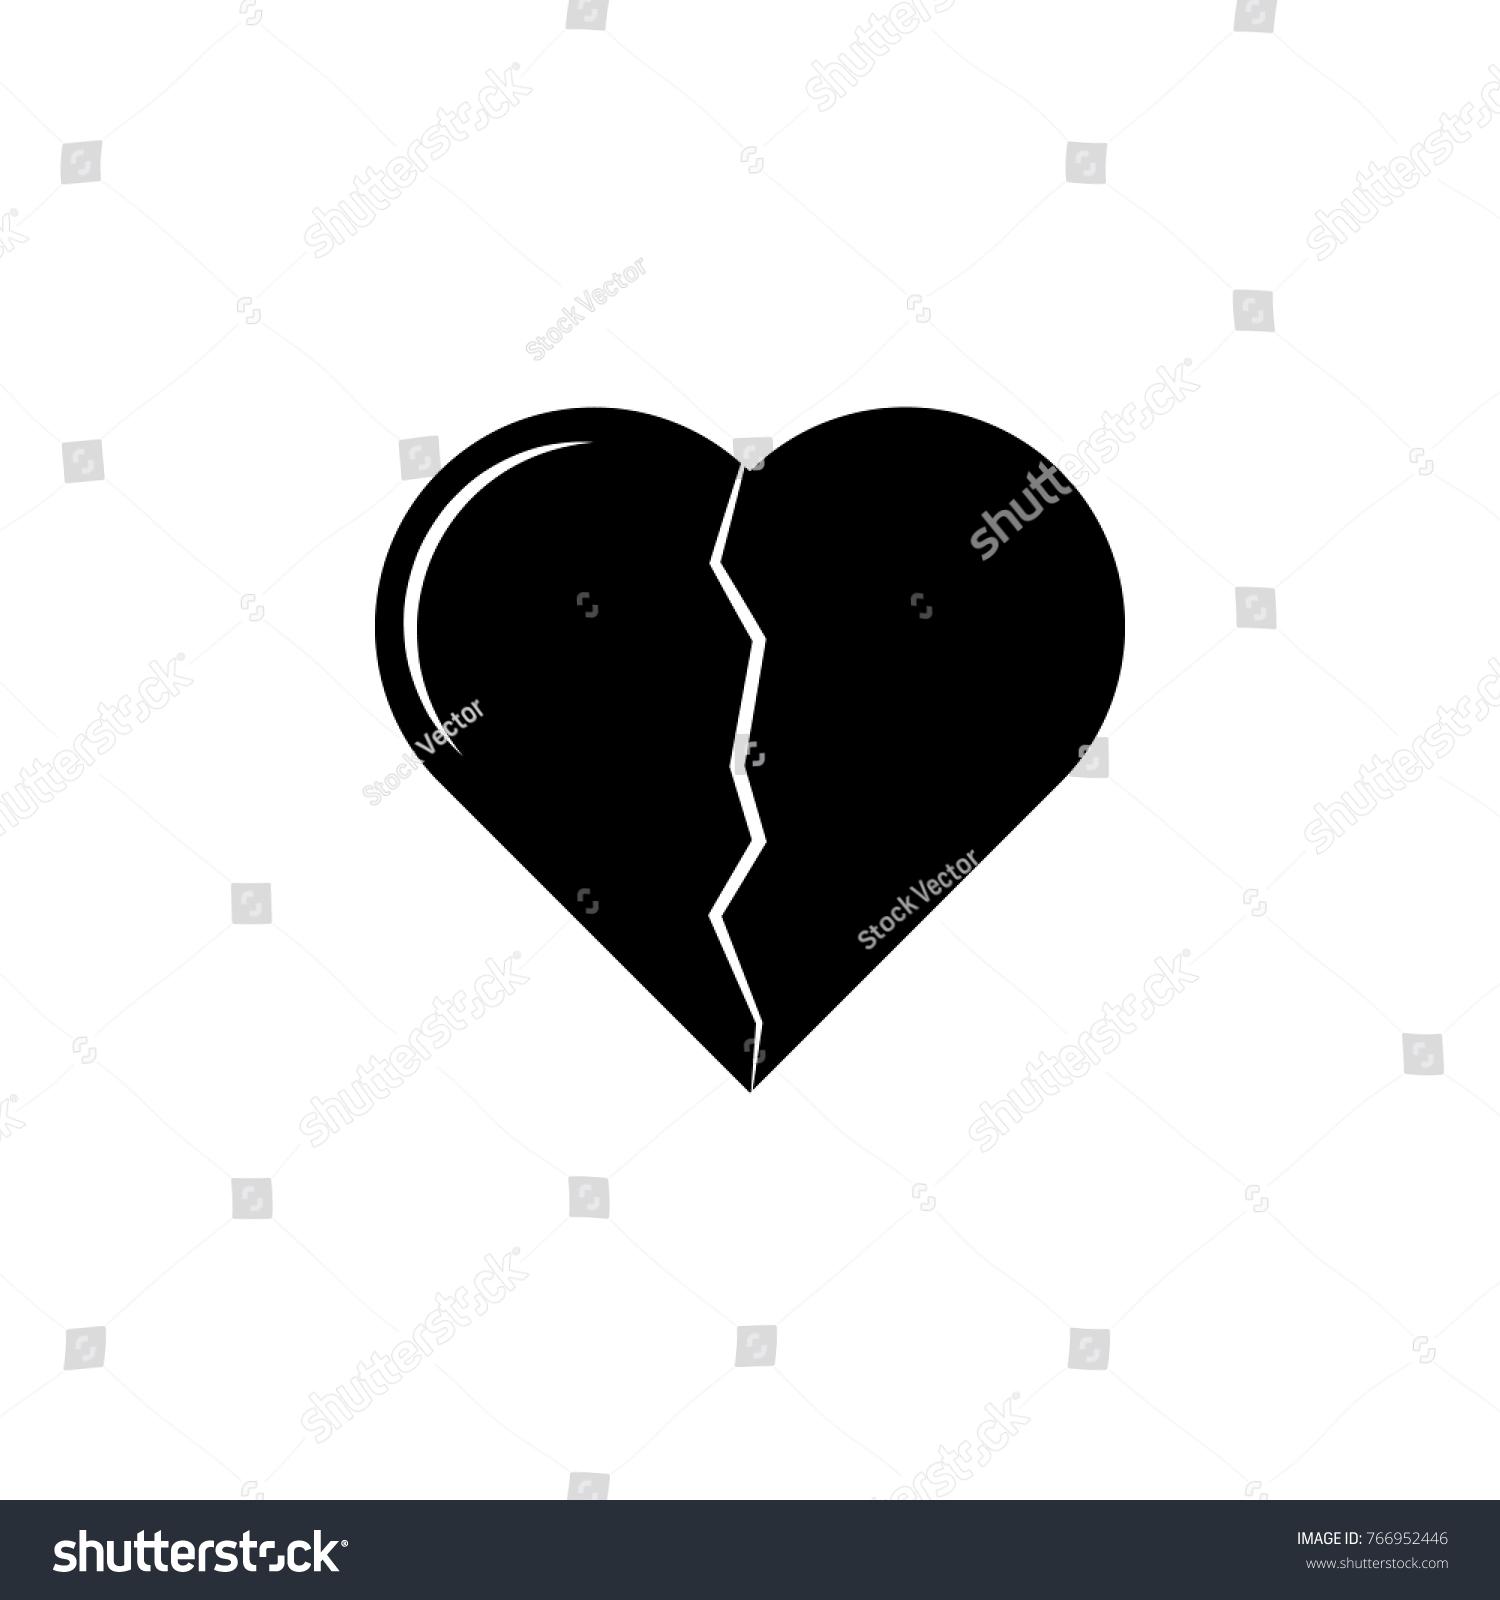 Broken heart icon love couple element stock illustration 766952446 broken heart icon love or couple element icon premium quality graphic design signs biocorpaavc Images